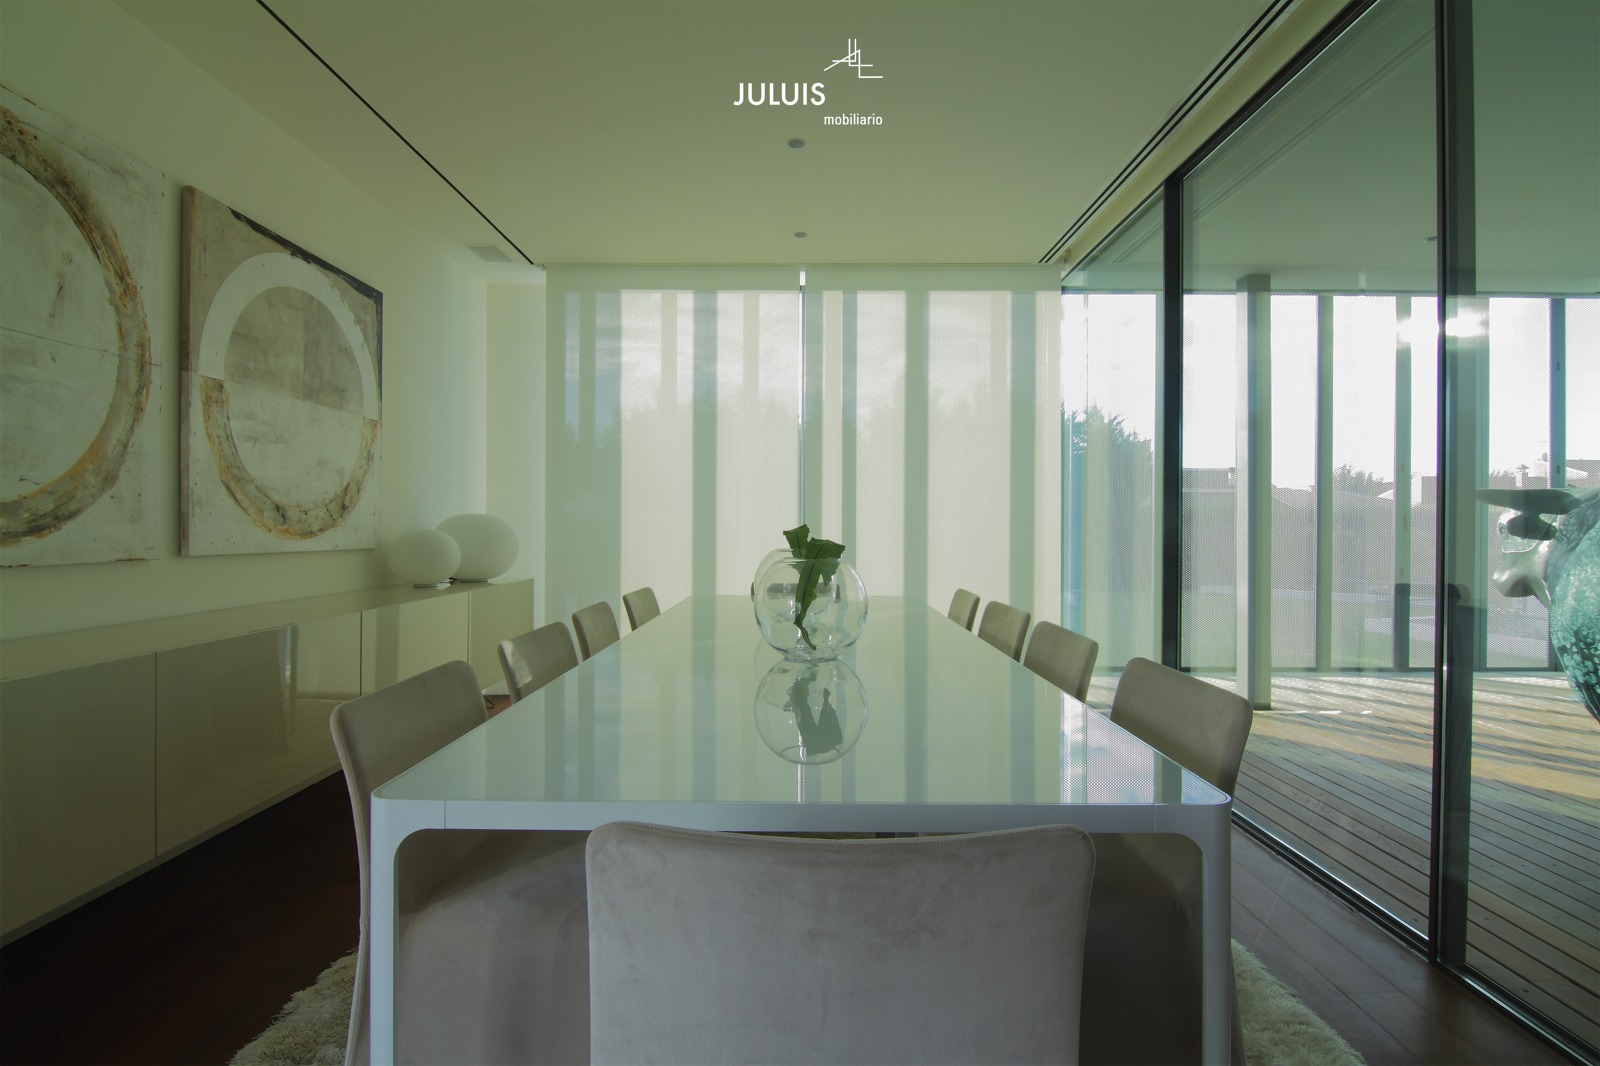 Juluis_Salon-comedor-Molteni-Flexform-09